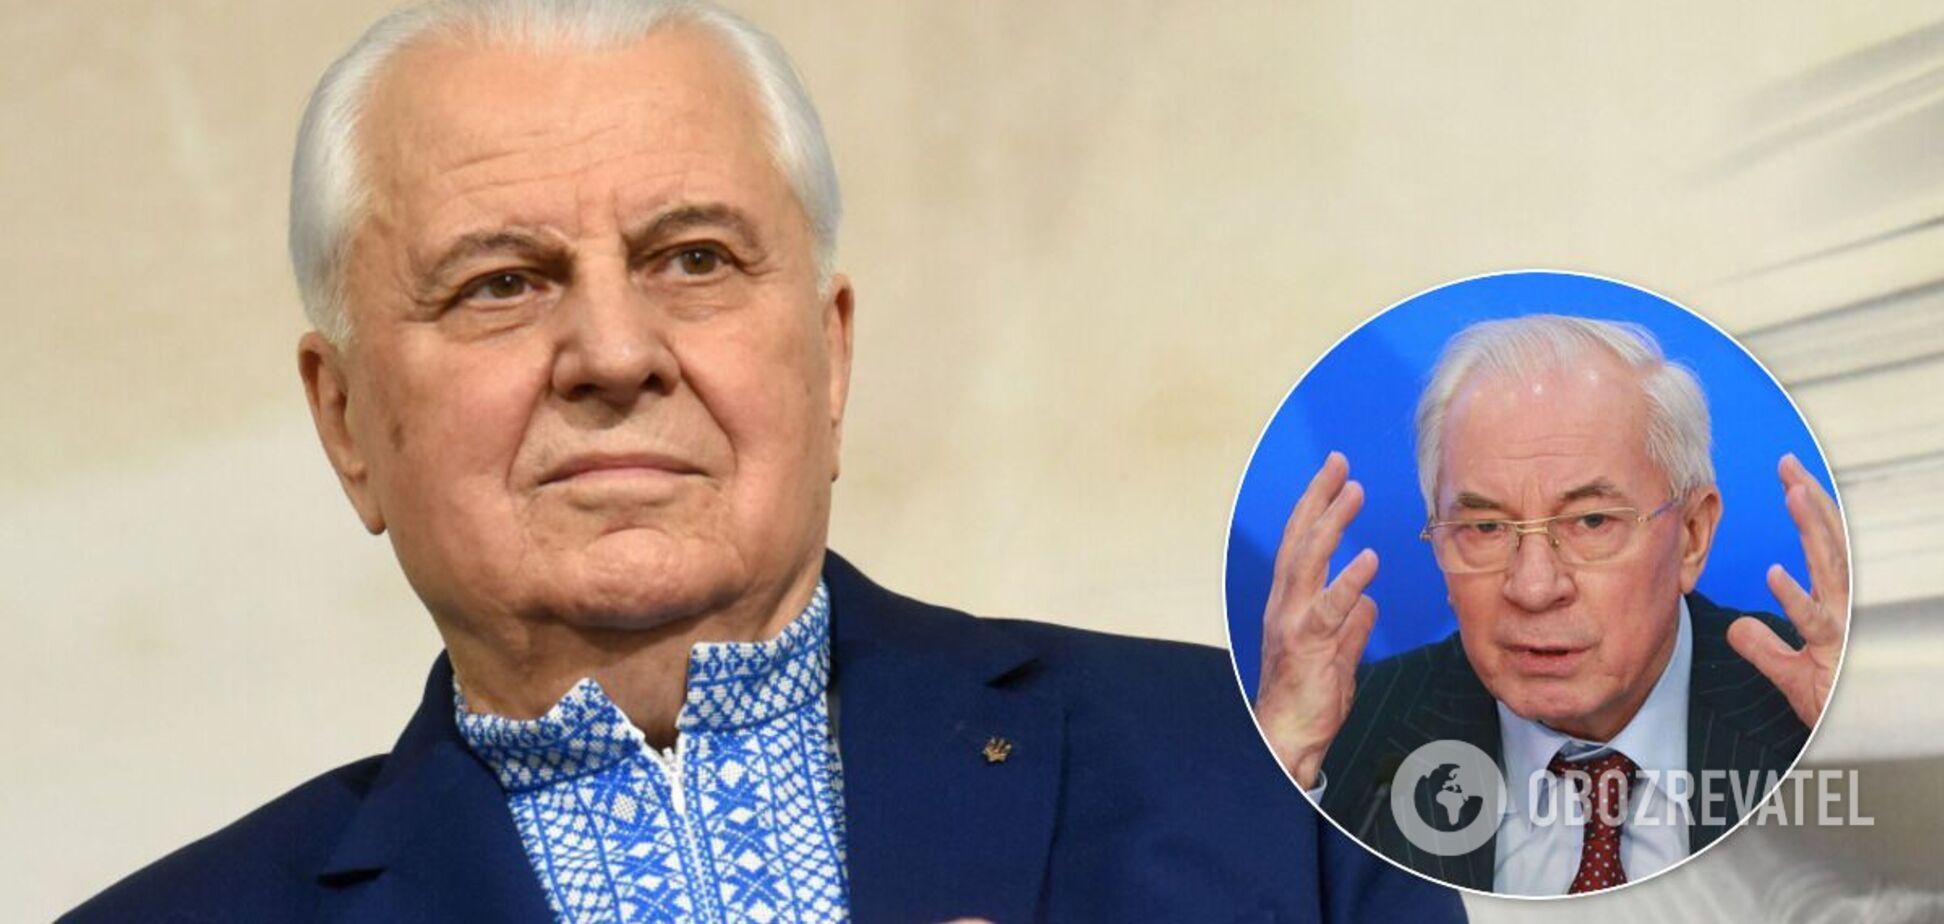 Прем'єр-втікач Азаров образив першого президента України Кравчука